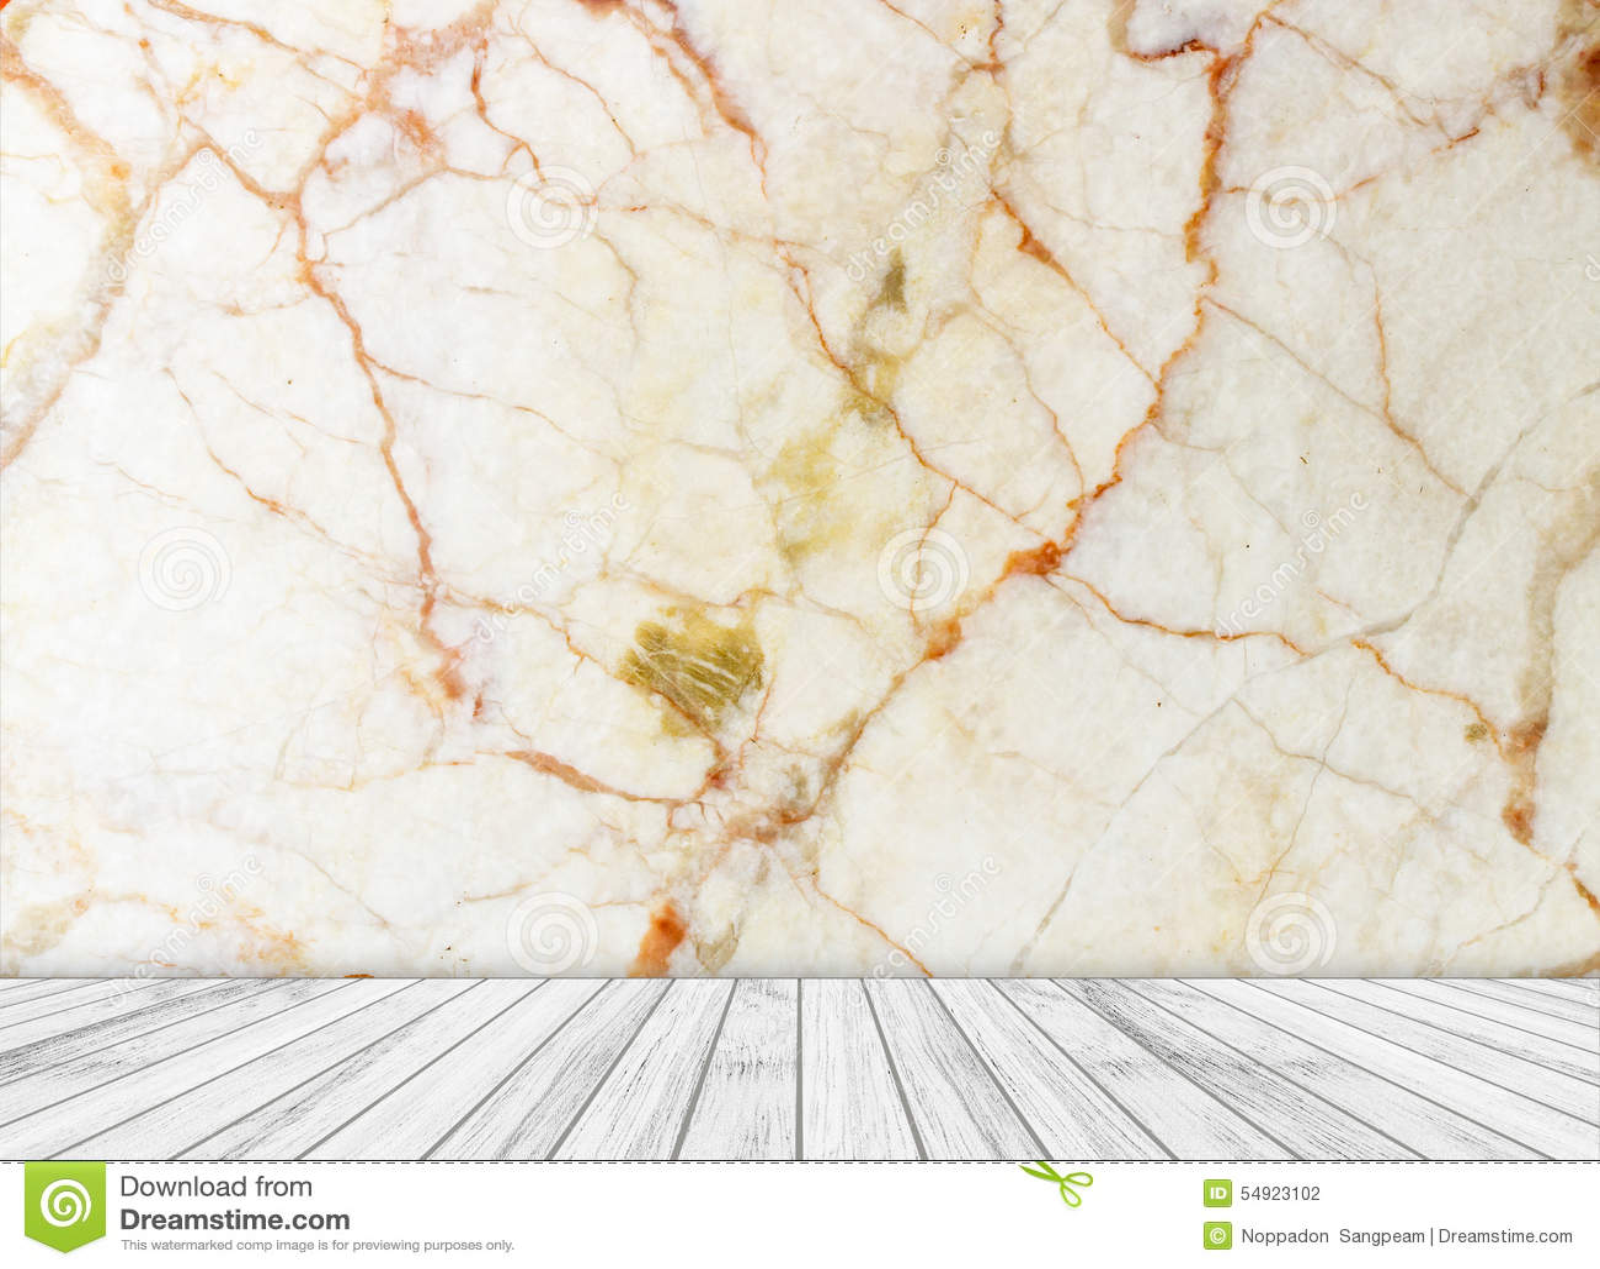 Marble Slab Design : White marble slabs royalty free stock photo